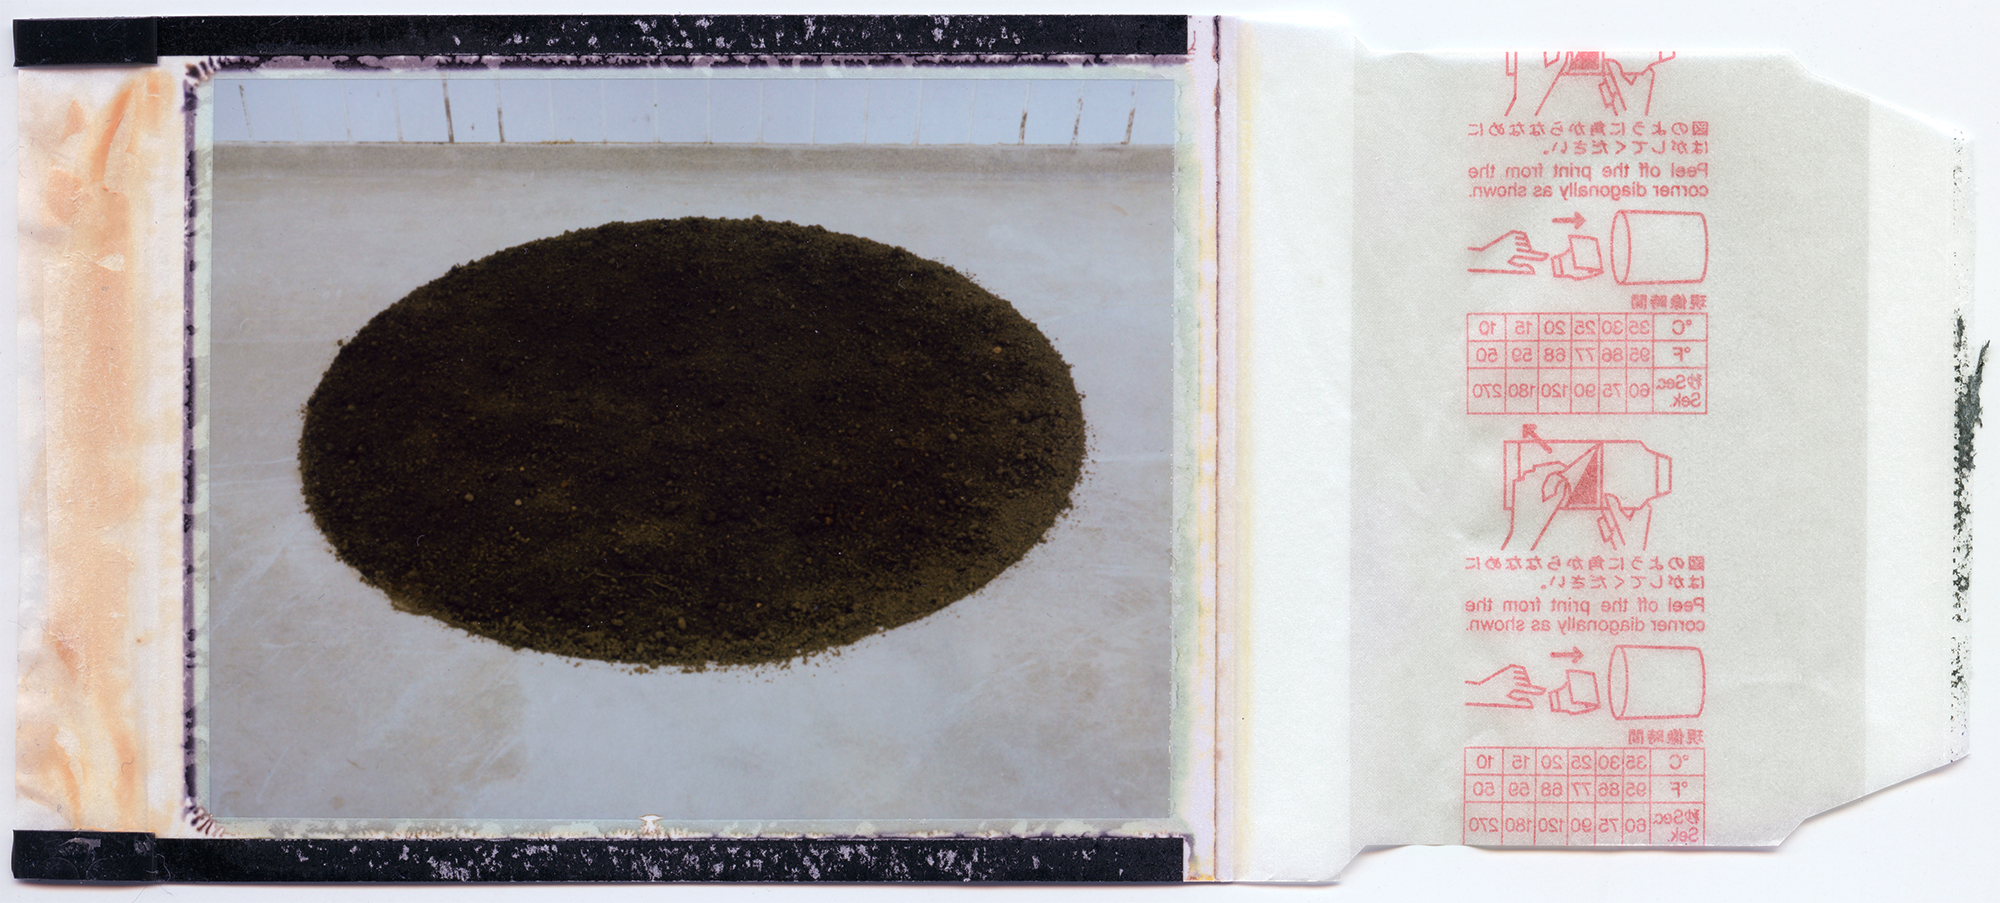 home soil / process 3# / polaroid 100 / h.pálmason 2016